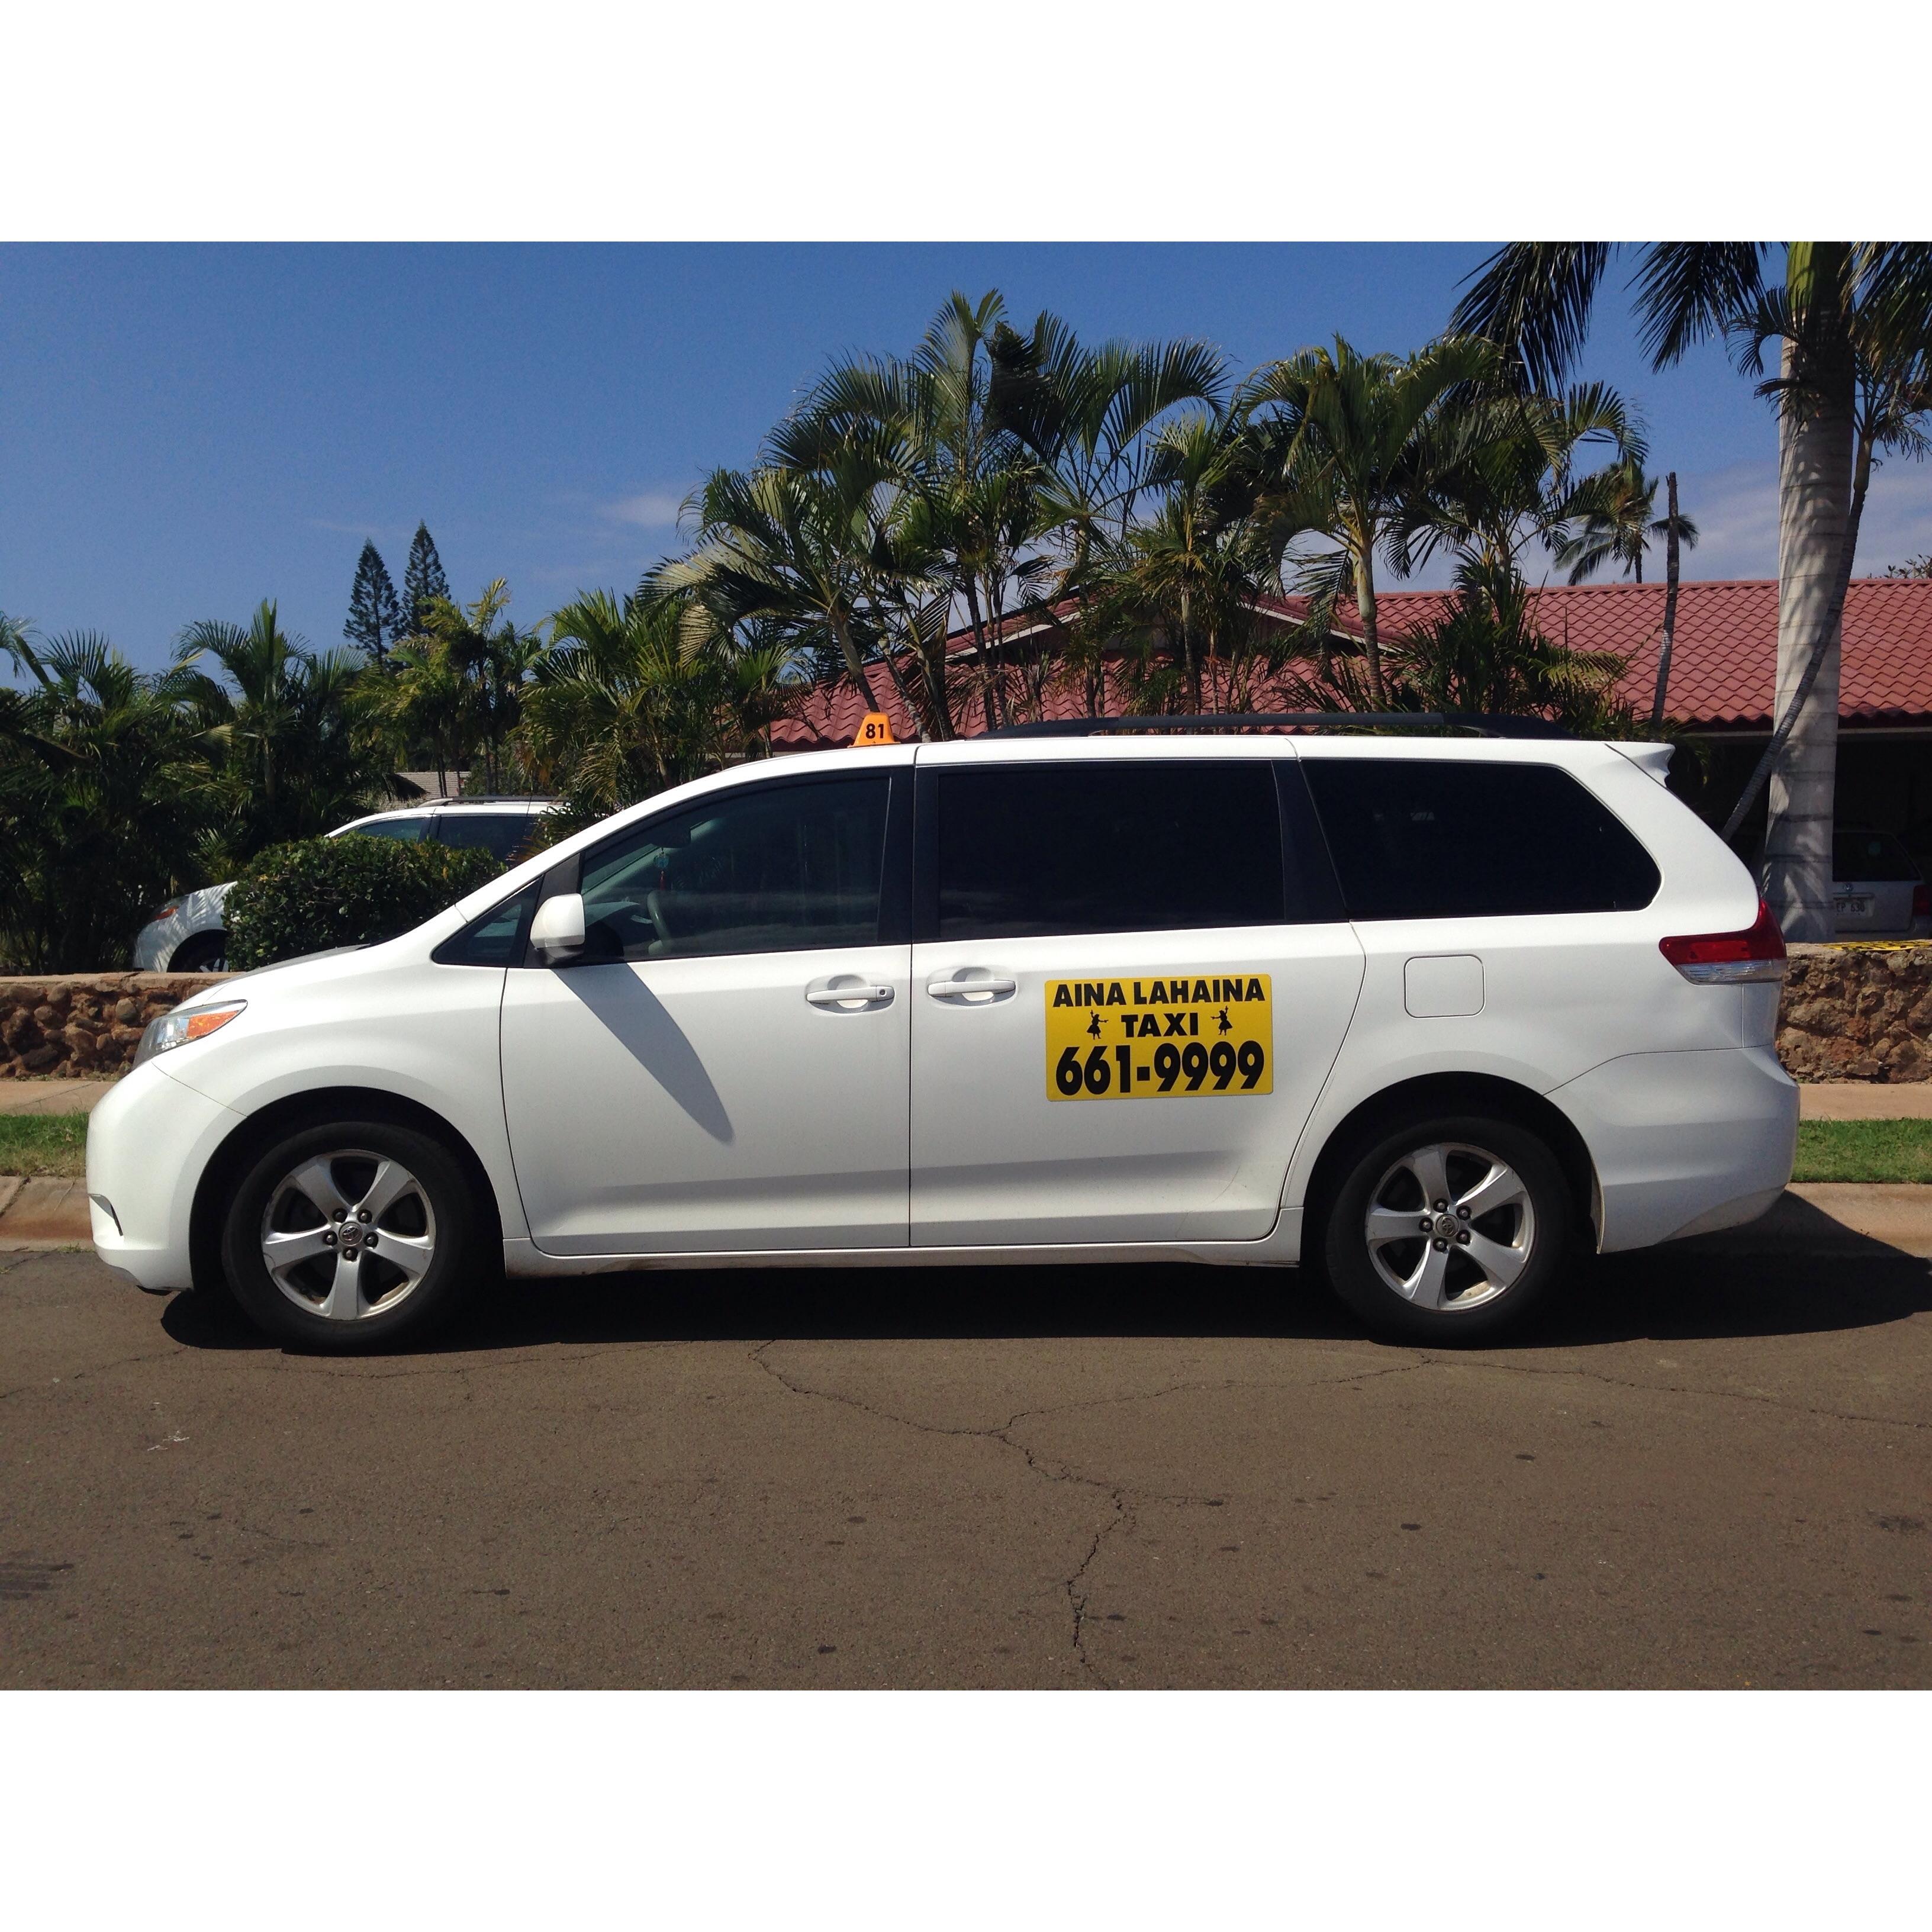 image of the Aina Lahaina Taxi